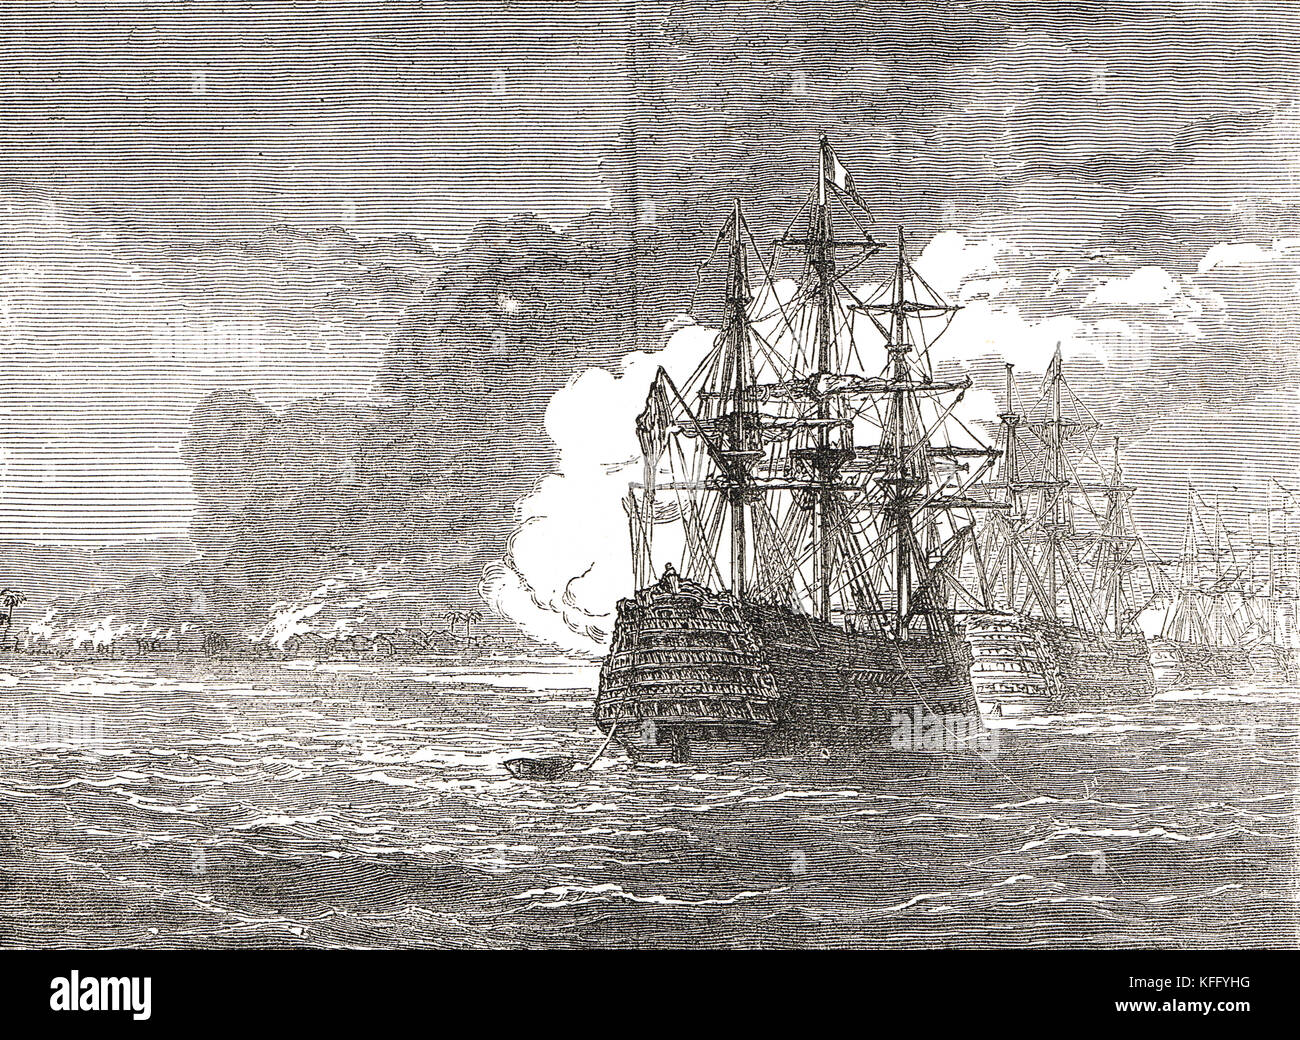 Burning of Roseau, Dominica, 1805 - Stock Image